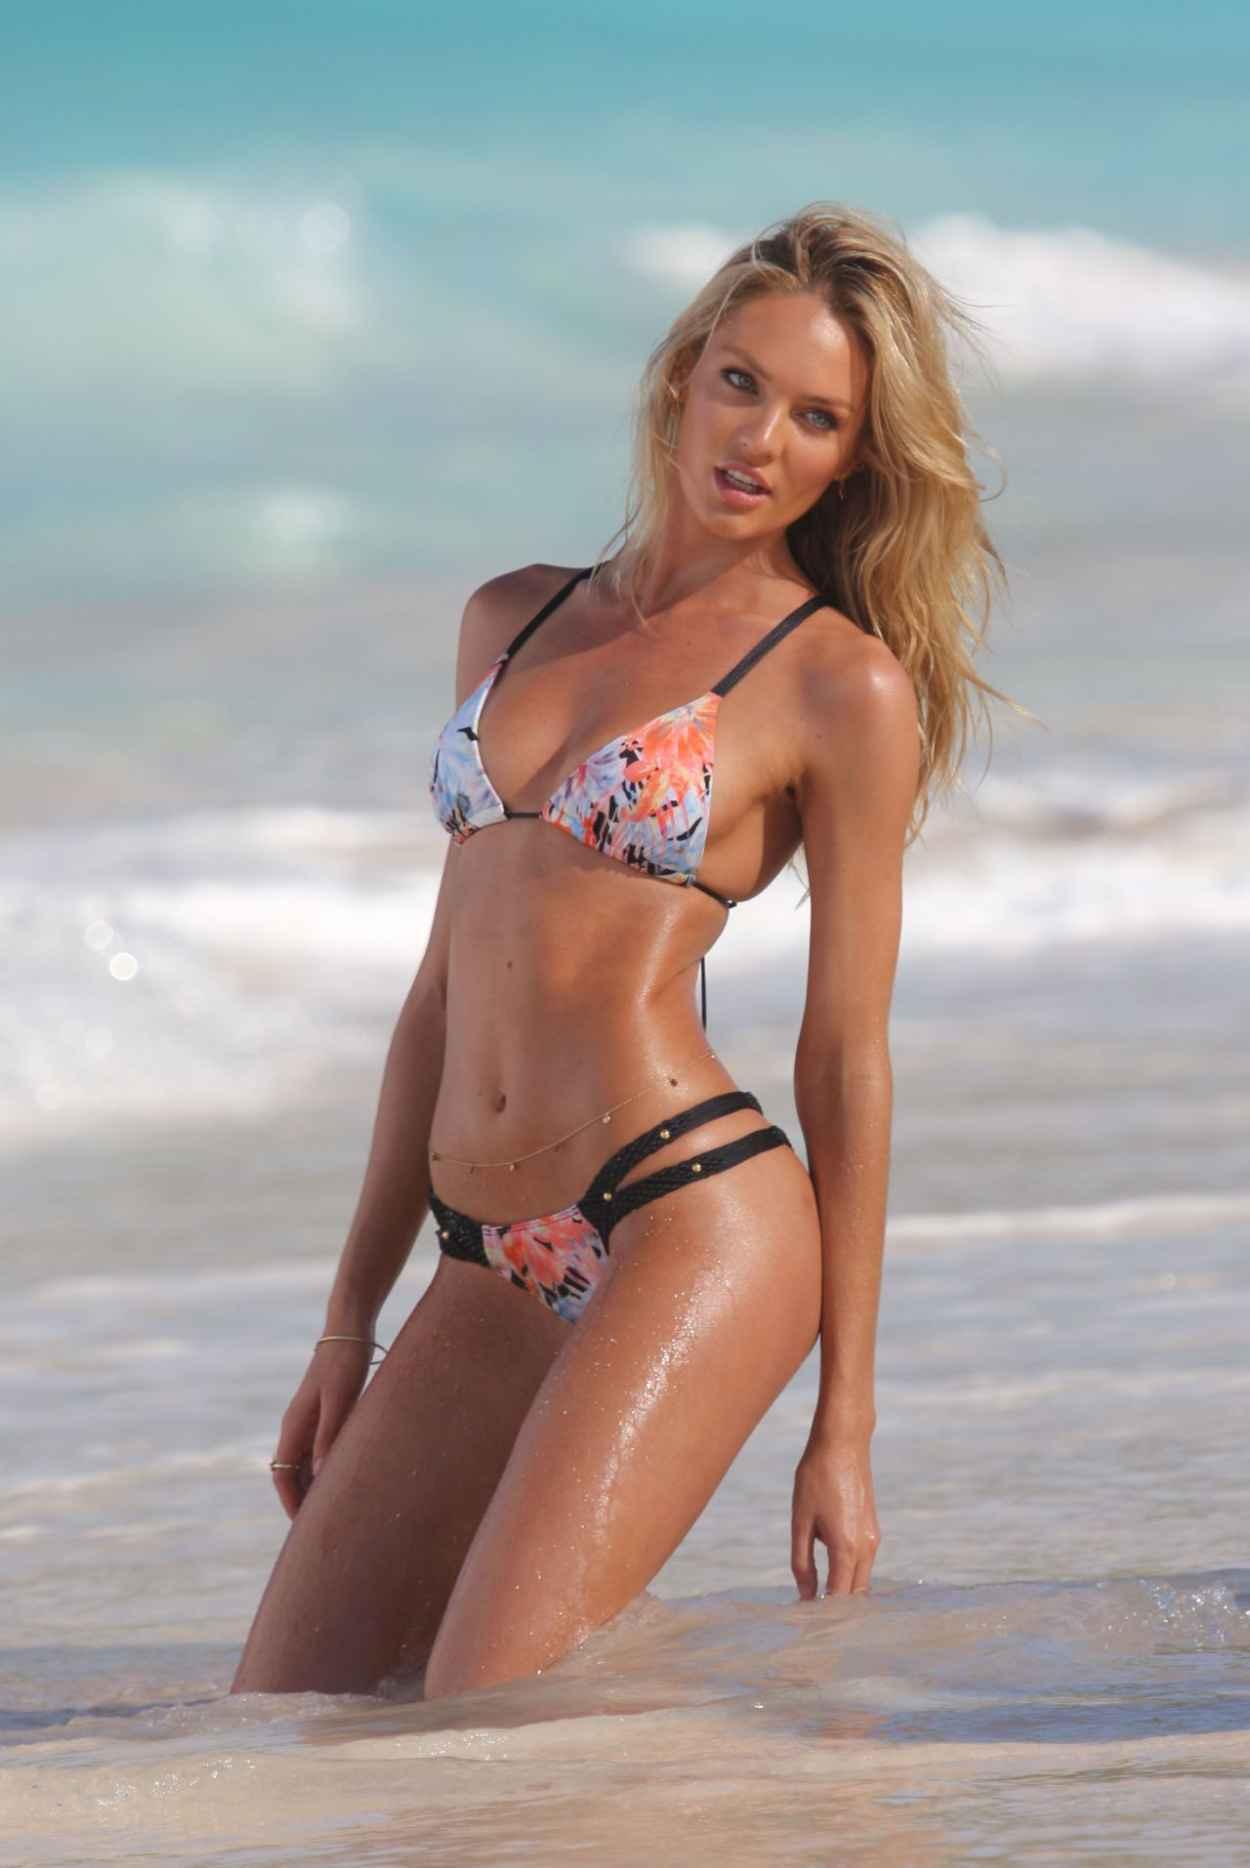 Candice Swanepoel Bikini Photoshoot - Victoria Secret Set in St. Barts - Part III-1